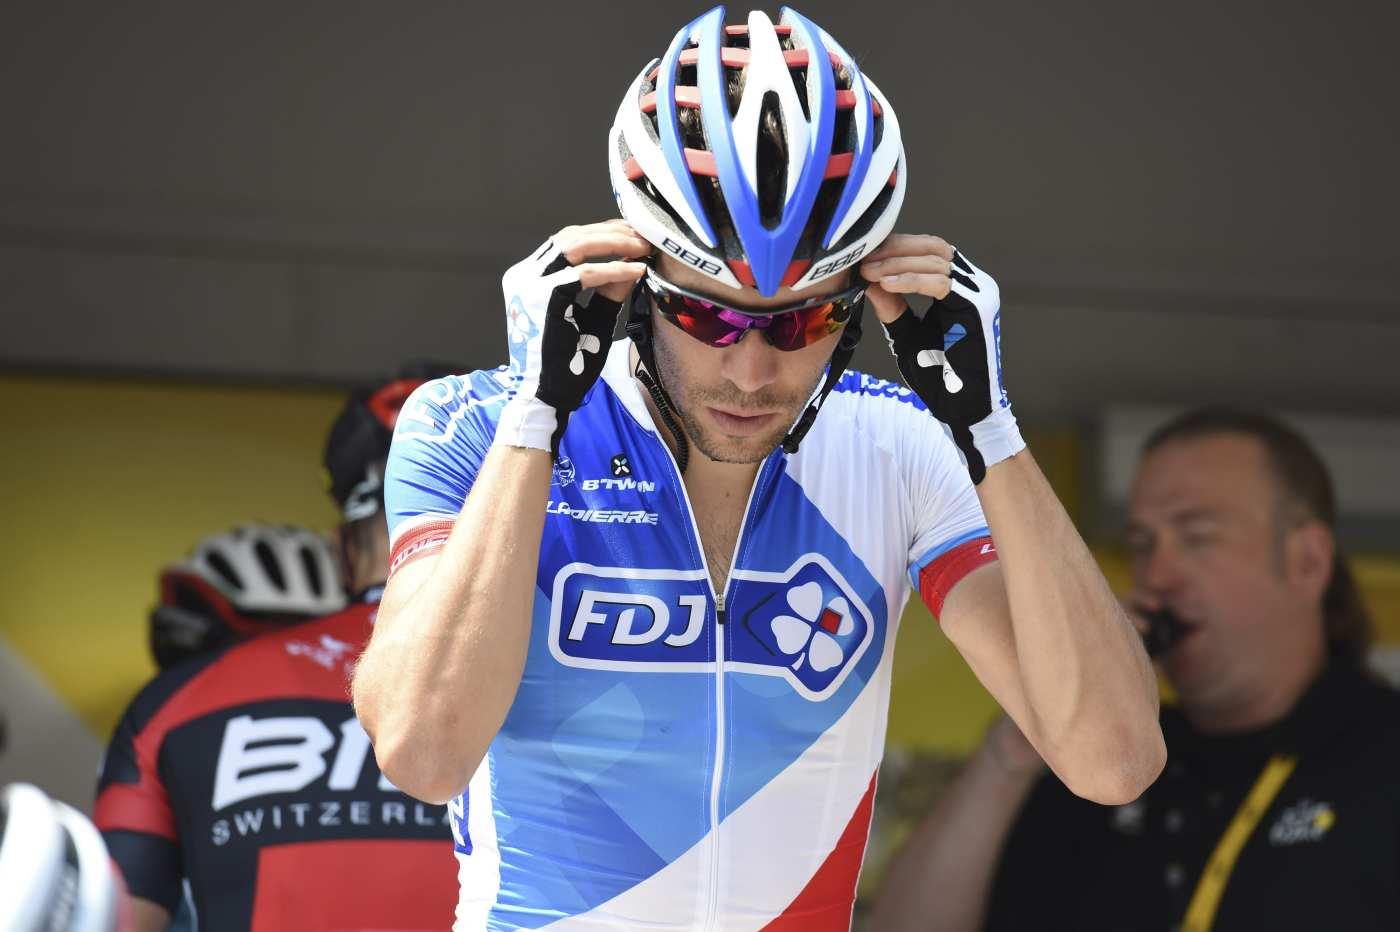 Cycling - 2015 Tour de France - Stage 2 - Utrecht to Zelande